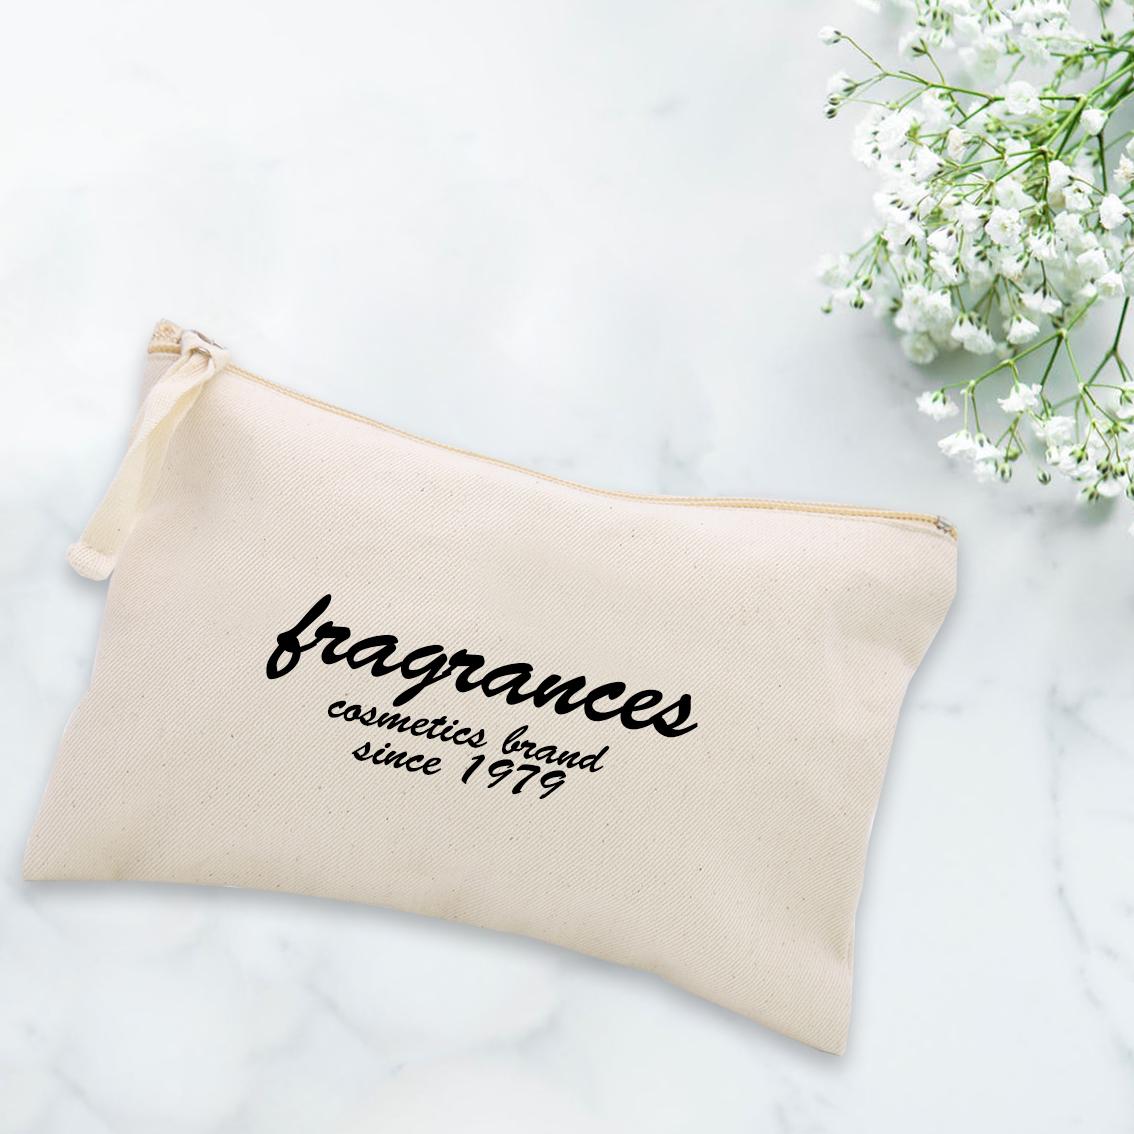 Cotton logo cosmetic bag for premium gift